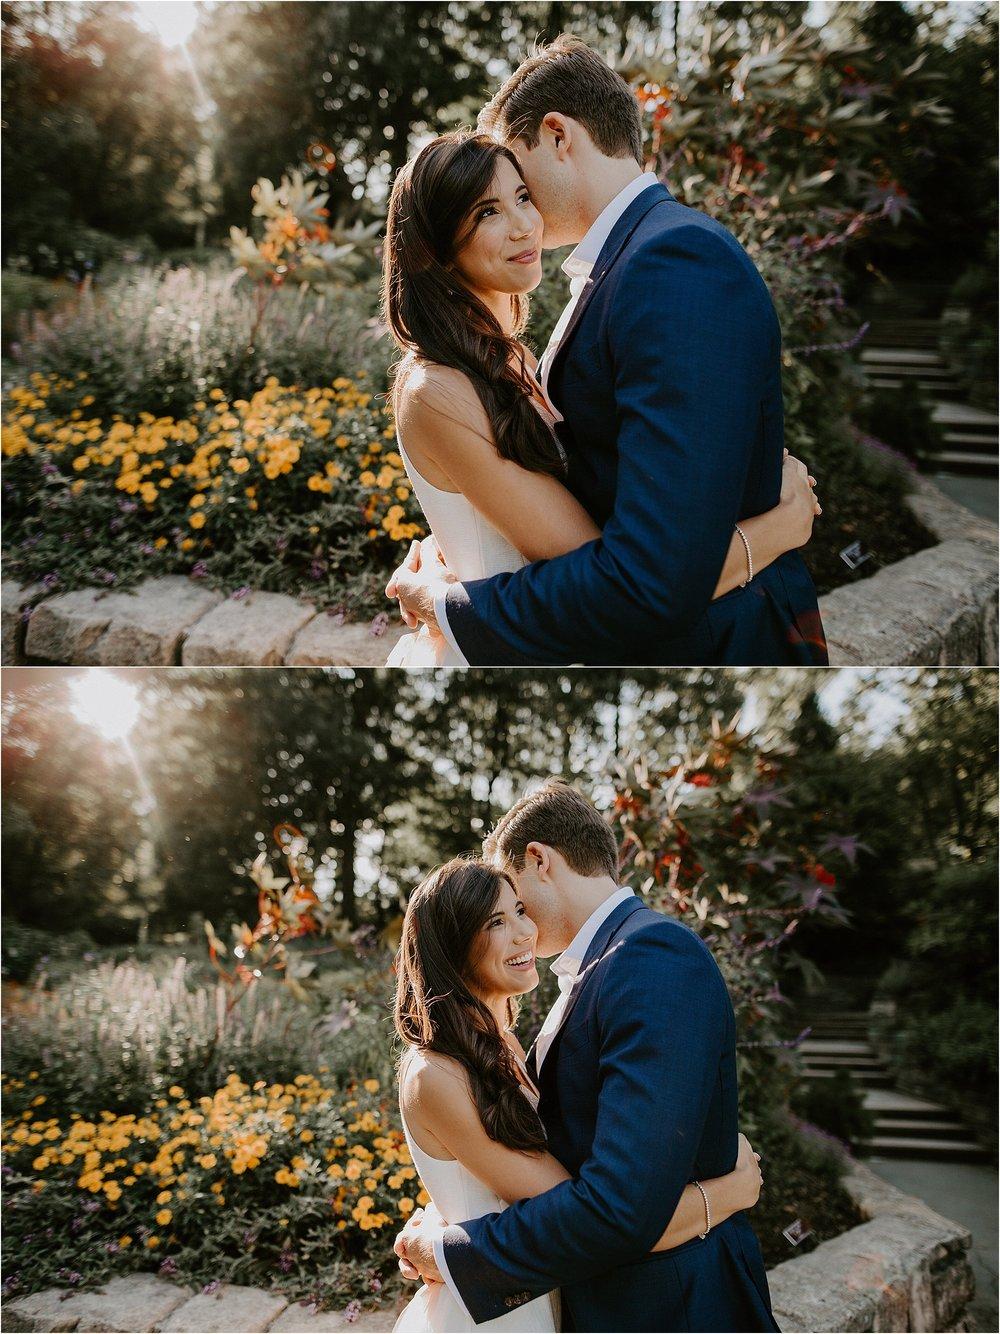 Sarah_Brookhart_Baltimore_Wedding_Photographer_0005.jpg